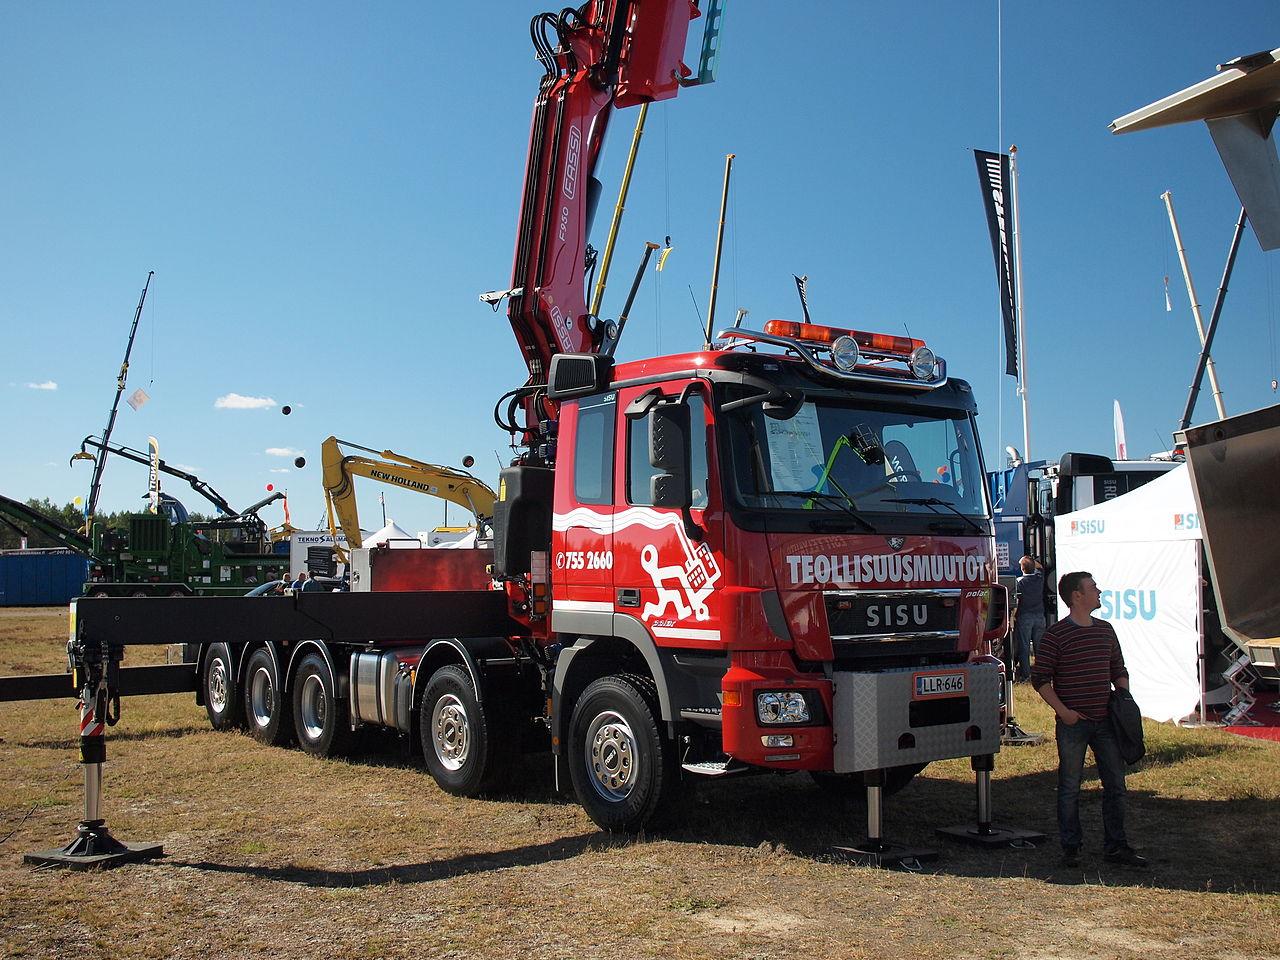 reg the scrapyard crane - photo #26